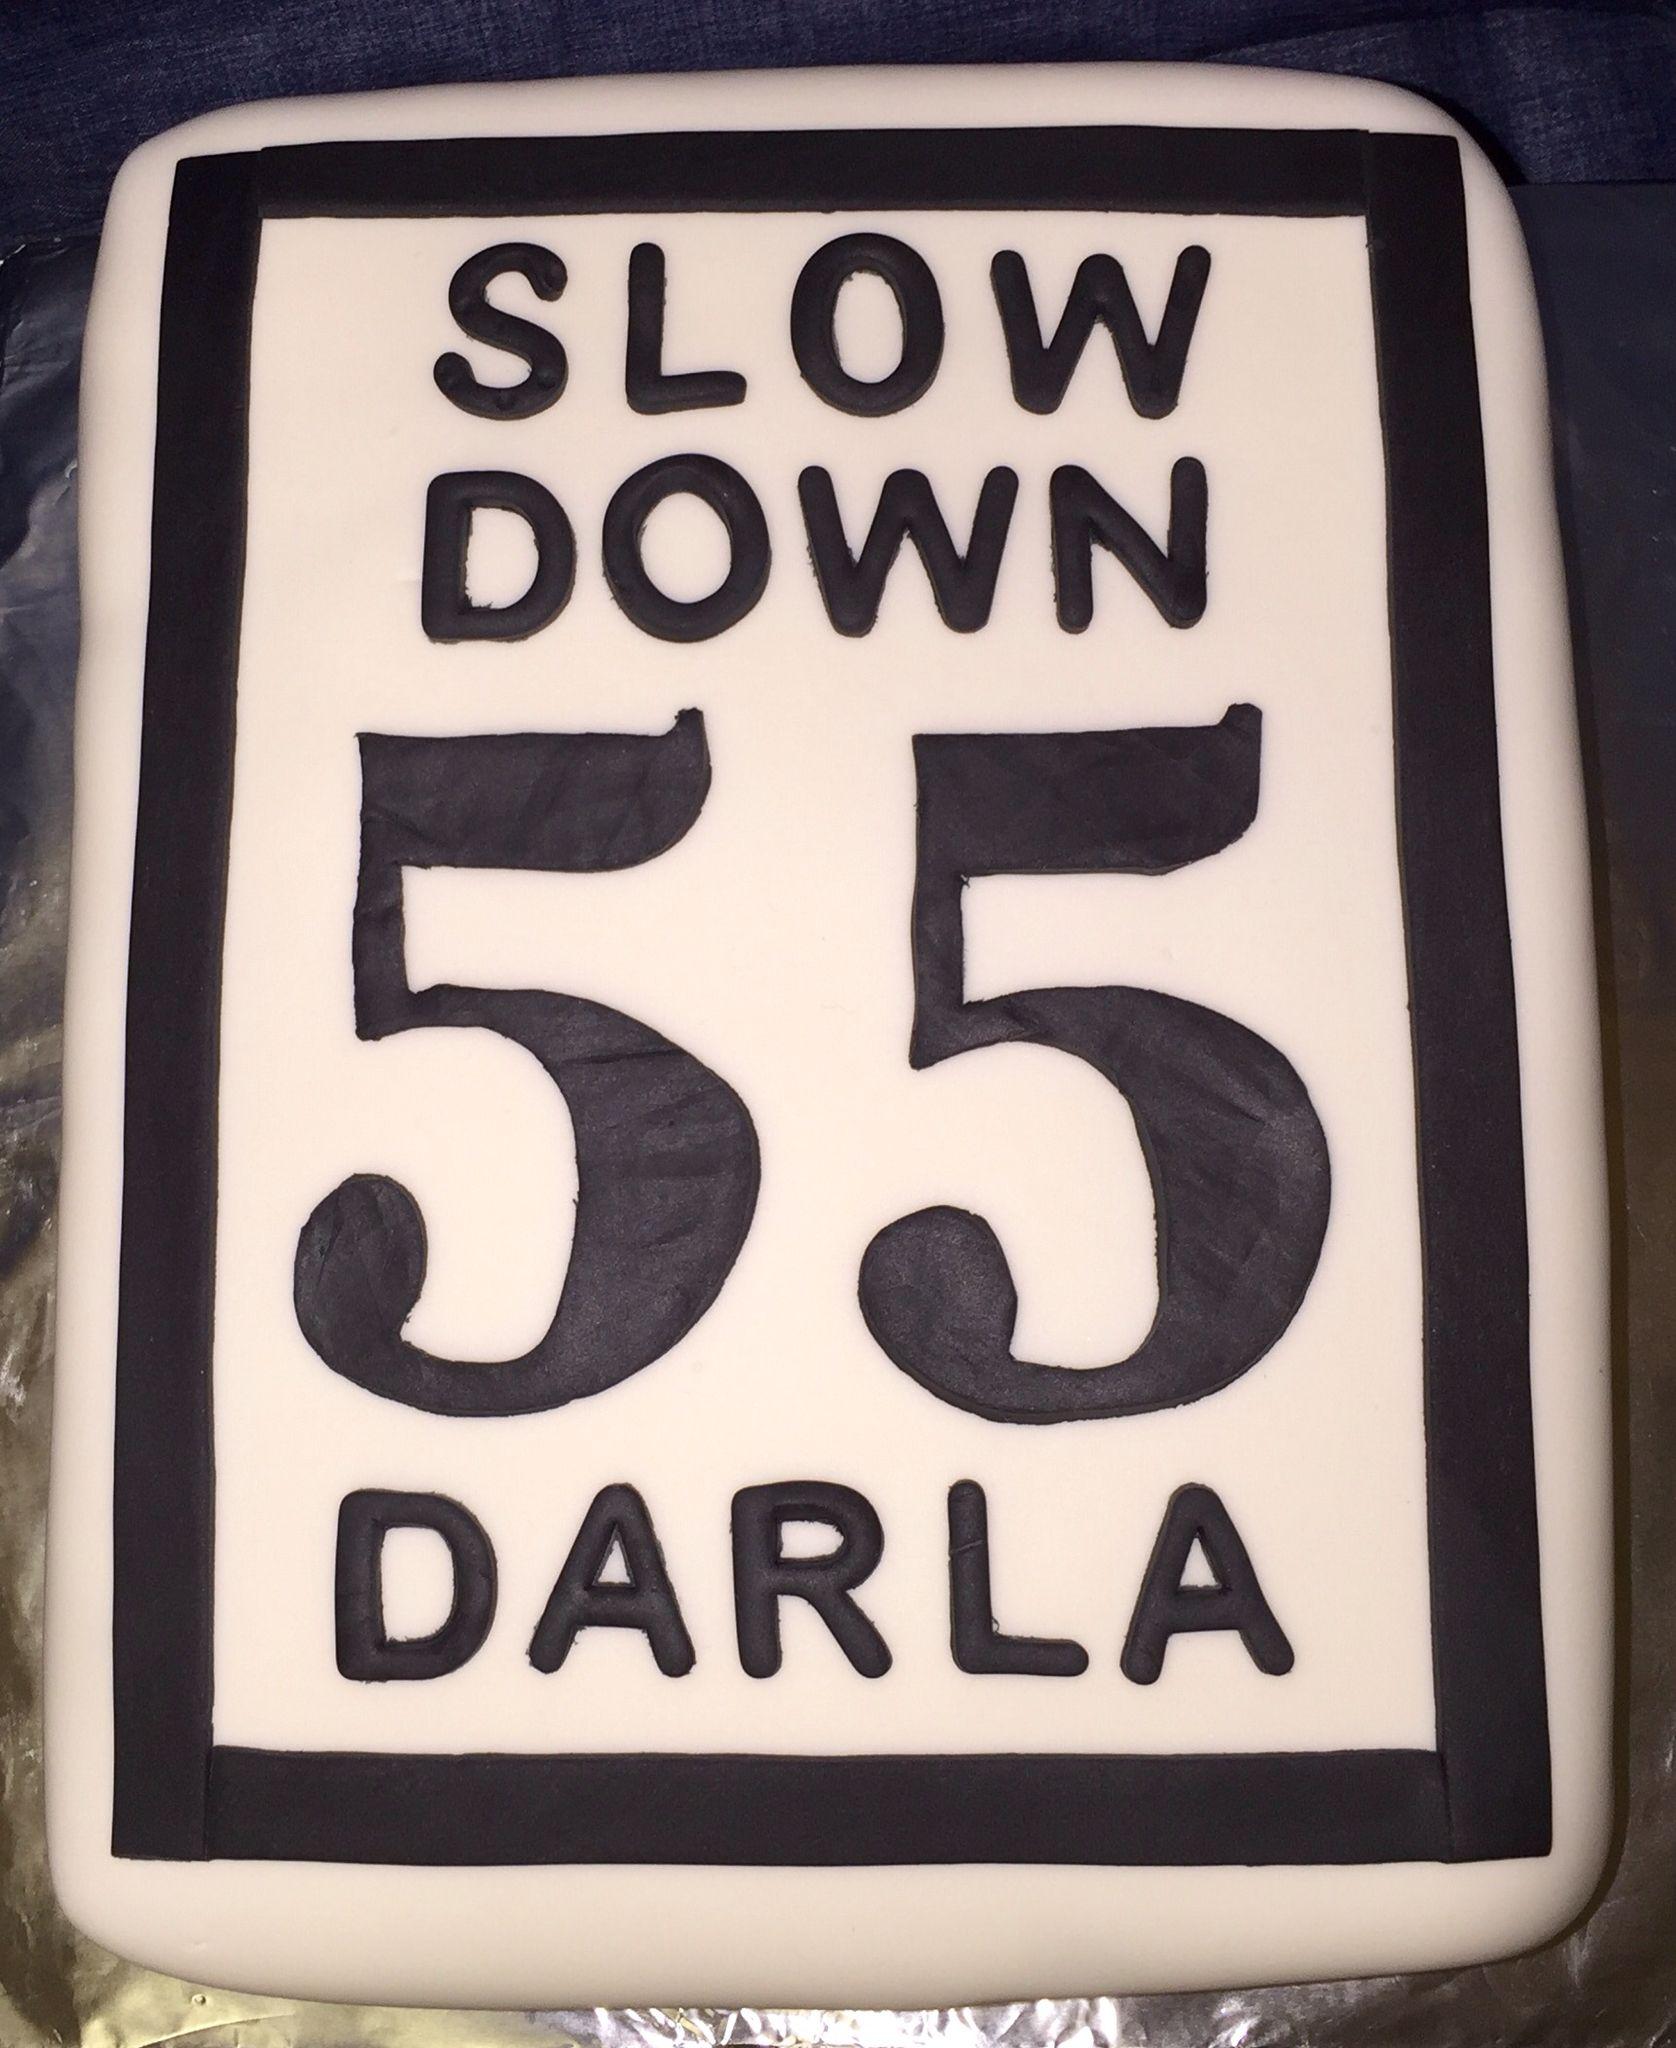 Shower Gifts Mum Birthday 55th Cake 55thbirthday Doublenickles Speedlimitcake Grandpa Dad Cakes